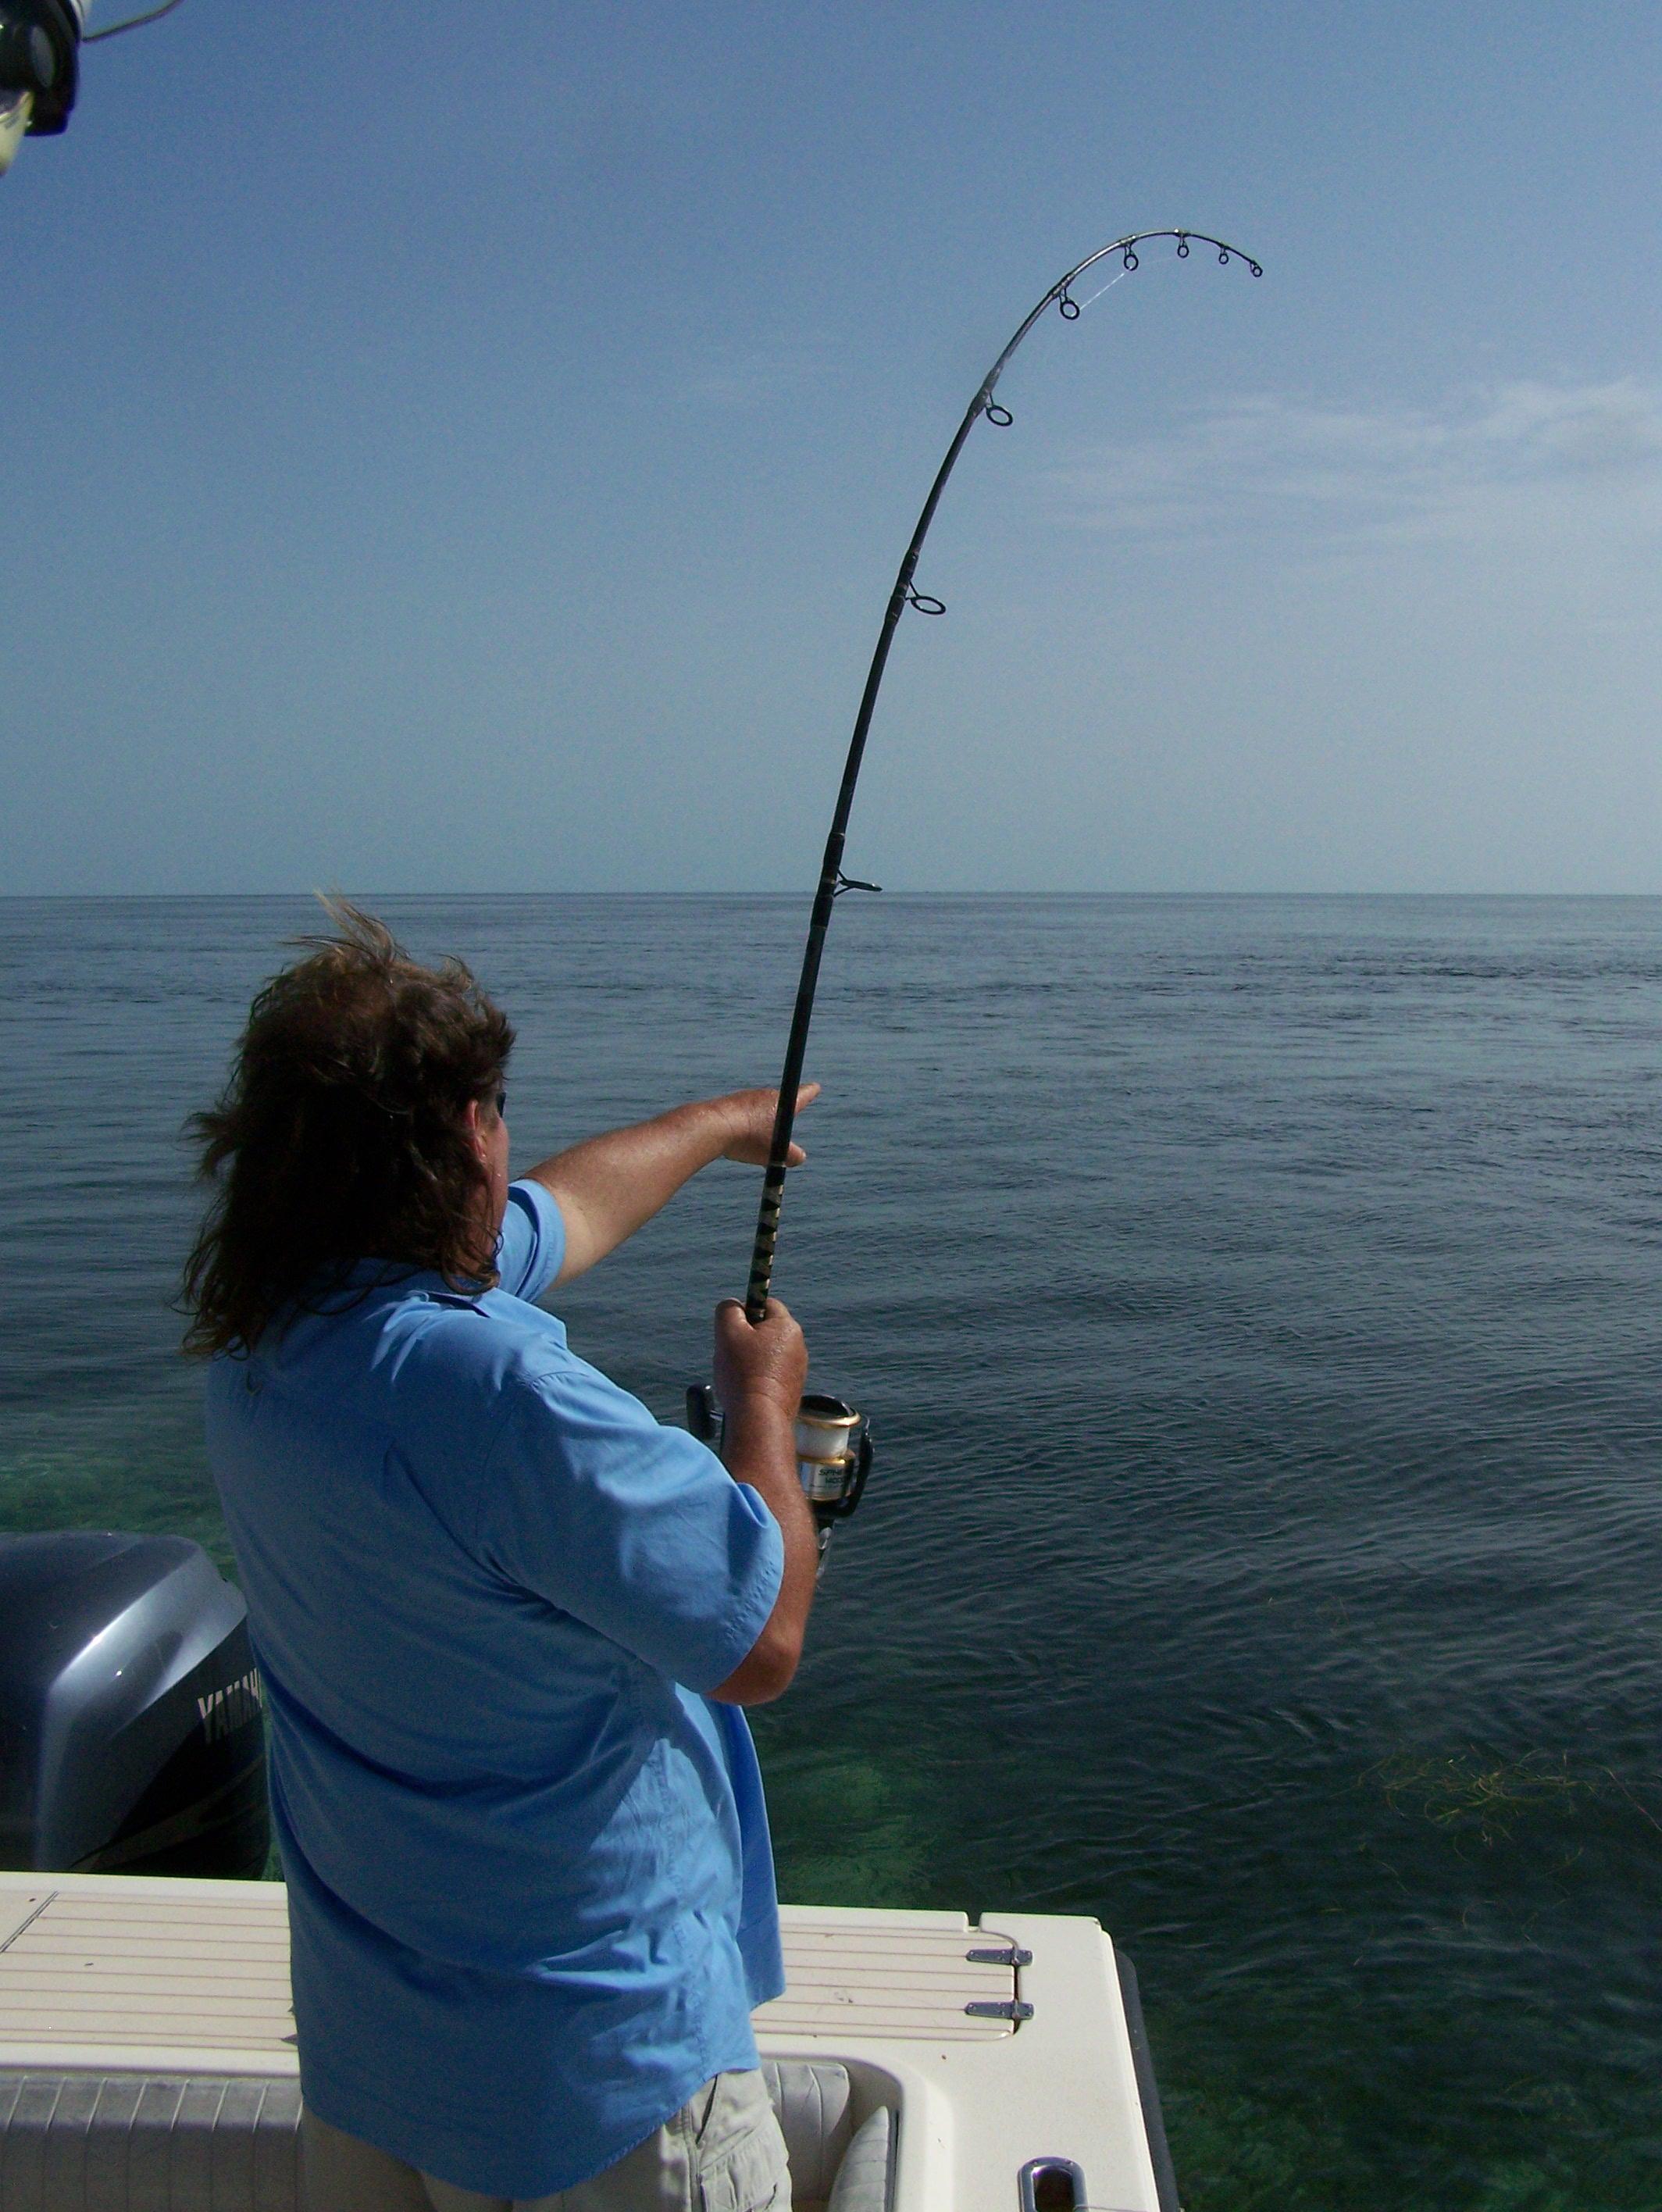 Florida keys shark fishing adventures with captain chris for Florida keys fishing trips